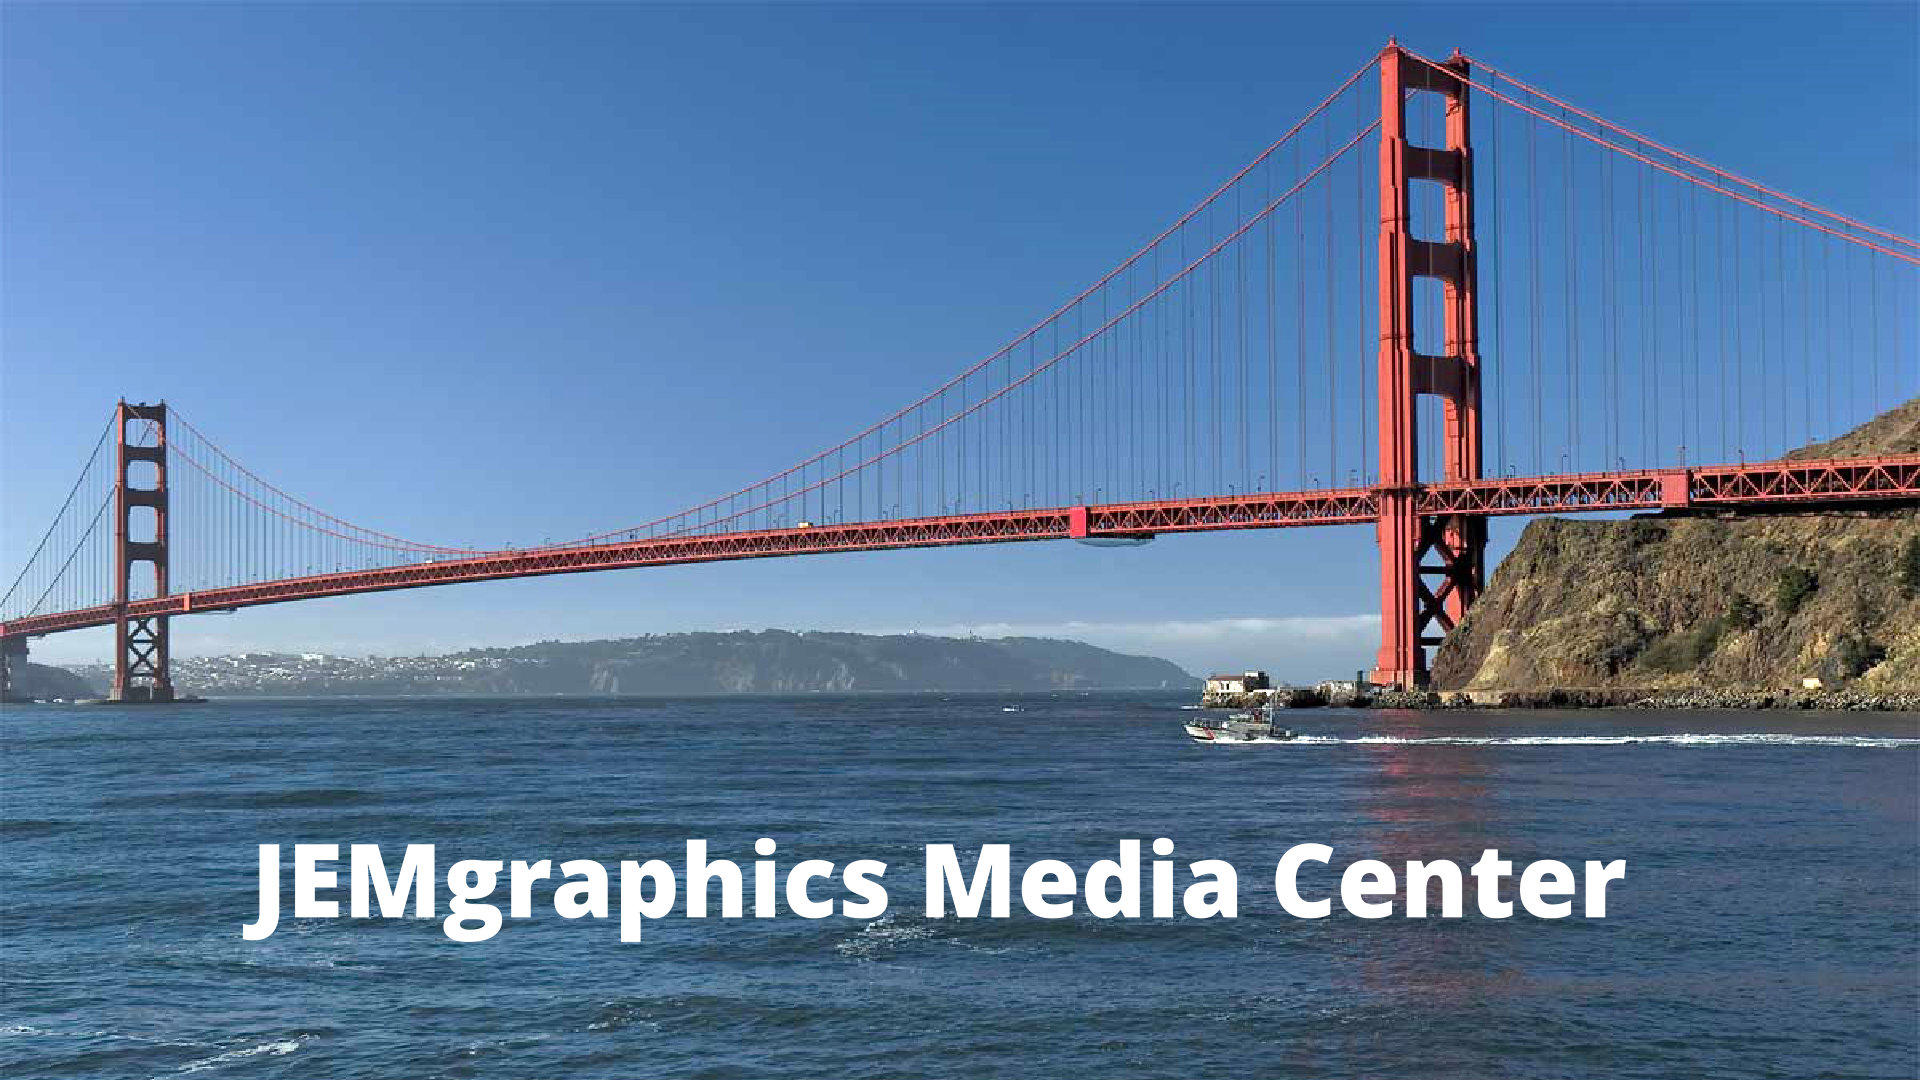 JEMgraphics Media Center image 14